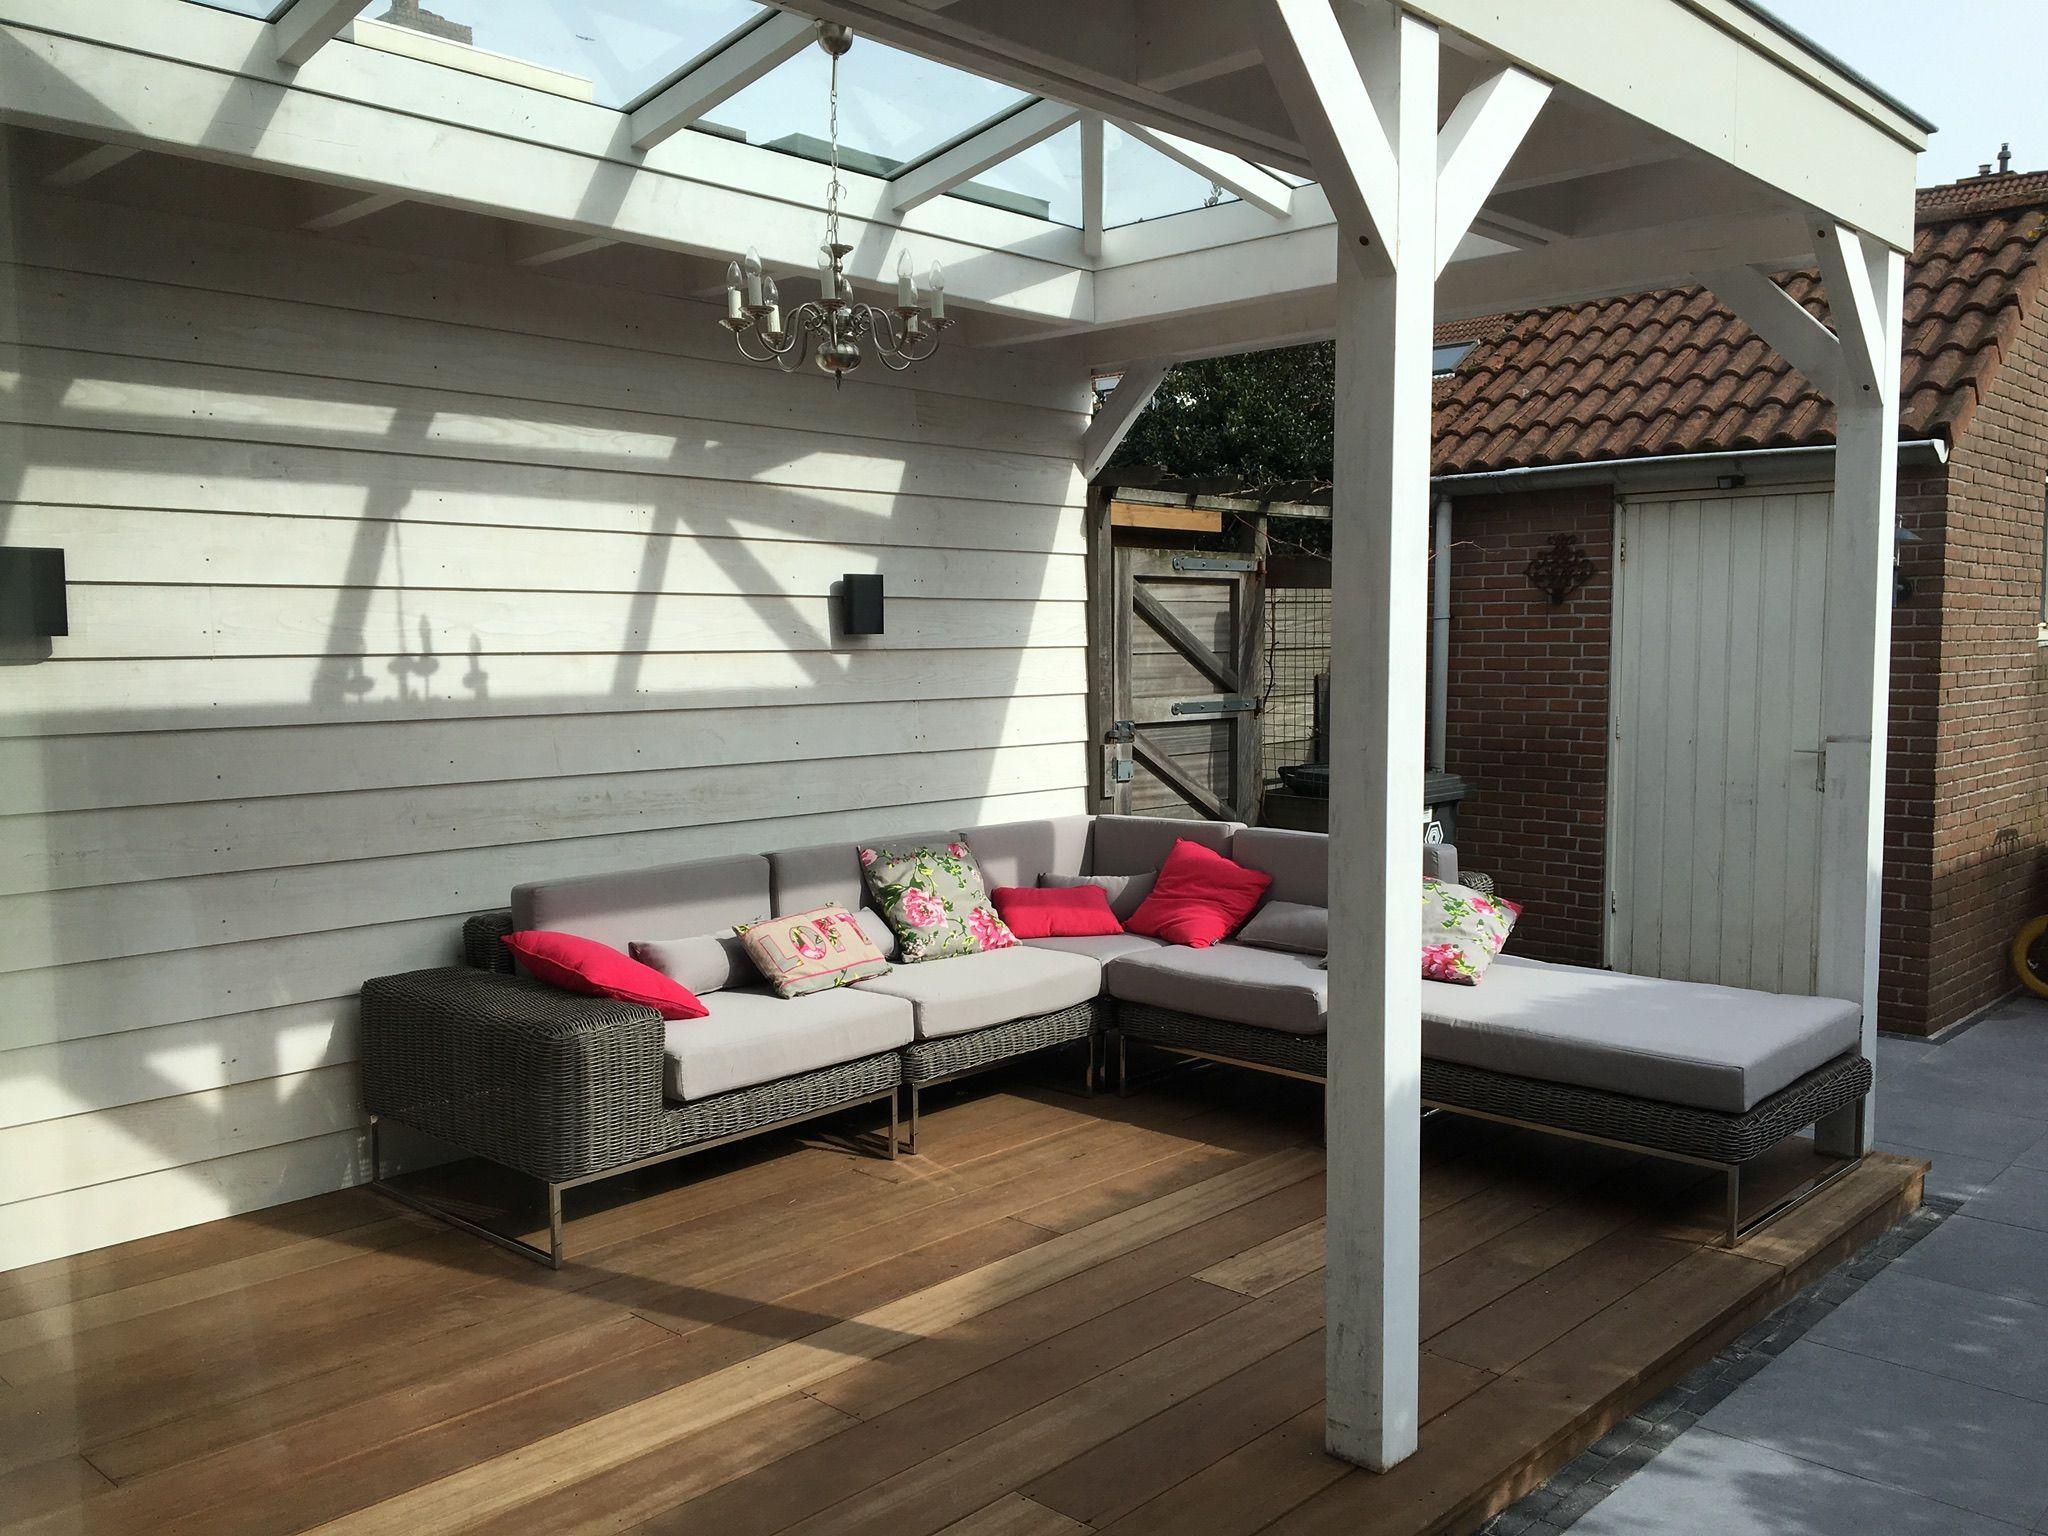 Loungeset lineo rond wicker grijs #outdoor #arbrini loungeset